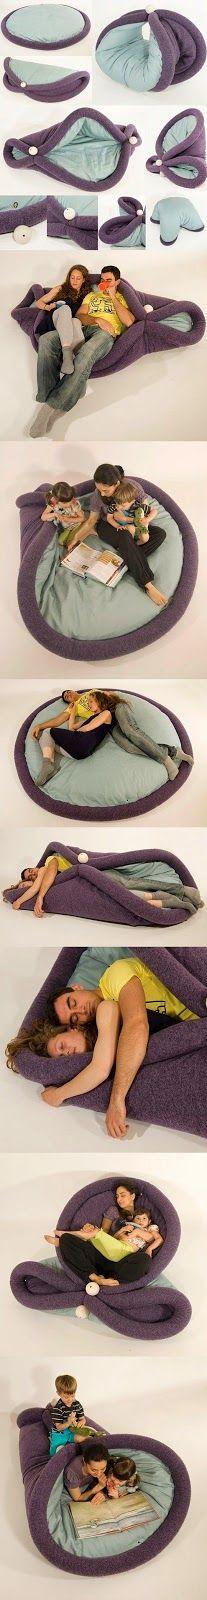 Convertible Sofa - convertible furniture | Interior Design